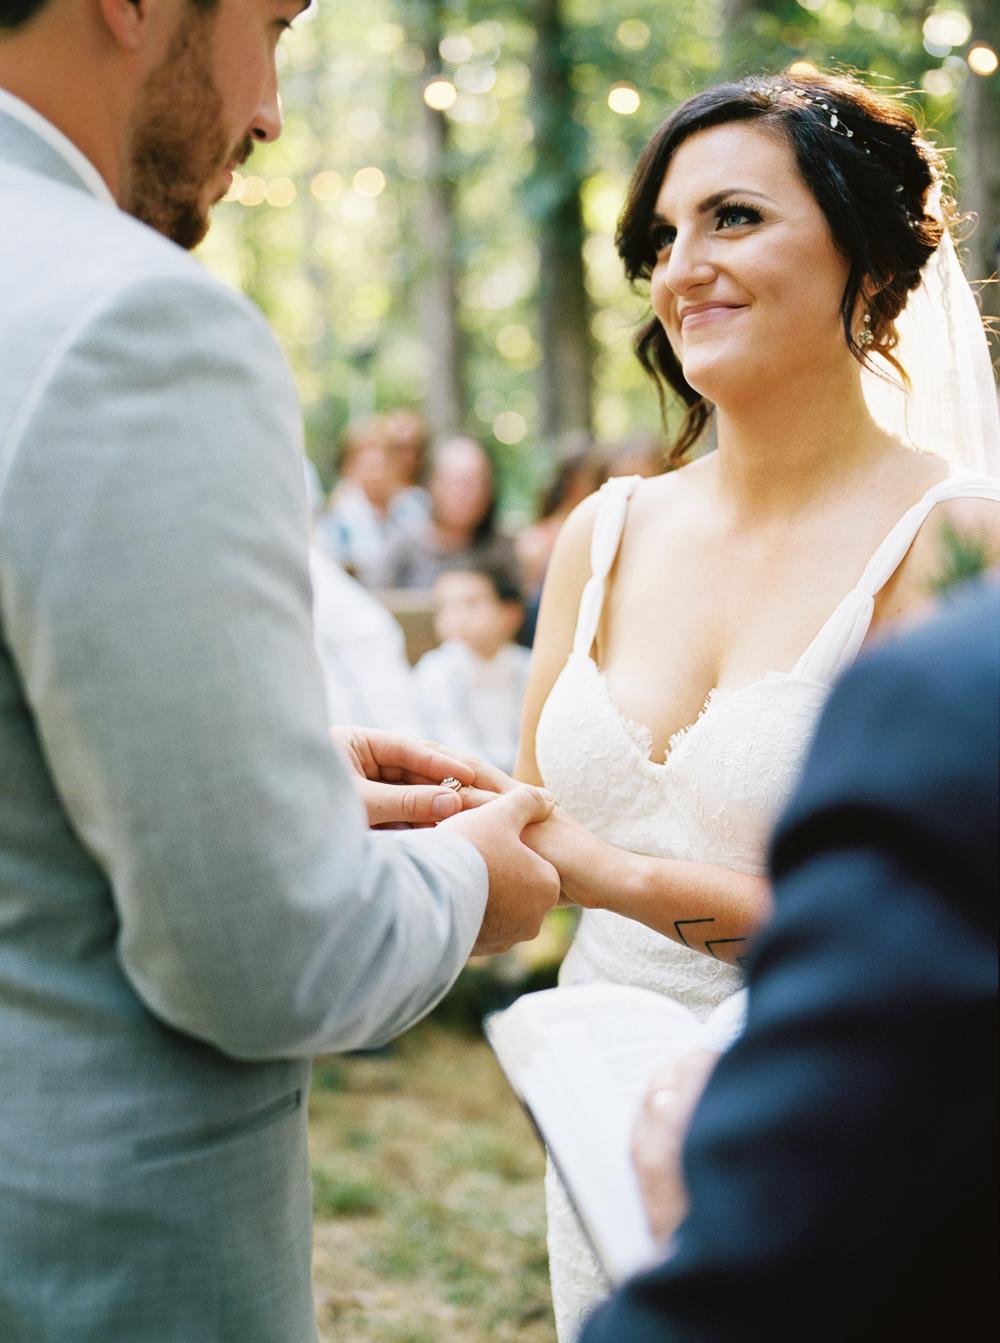 jamie+trey_wrens nest film wedding photographers natural light ©2016abigailbobophotography-29.jpg